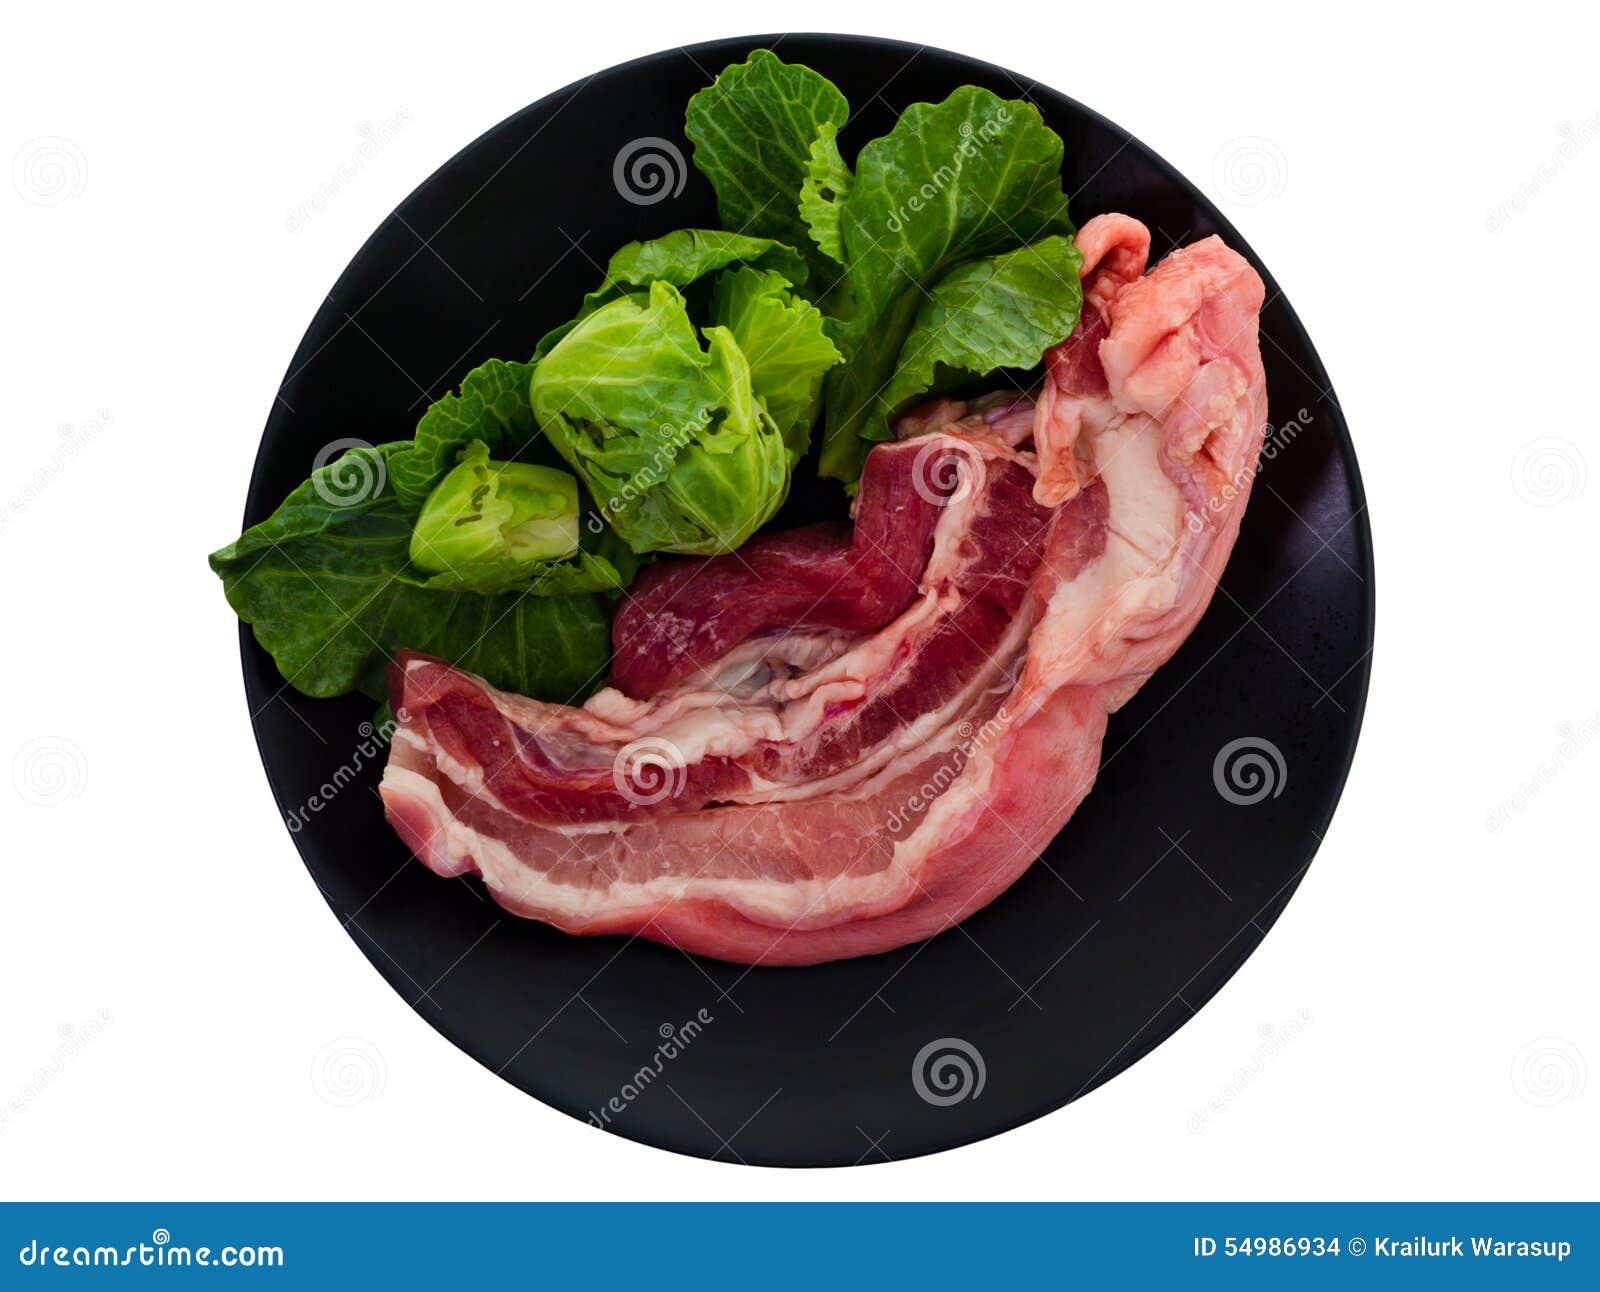 Streaky pork